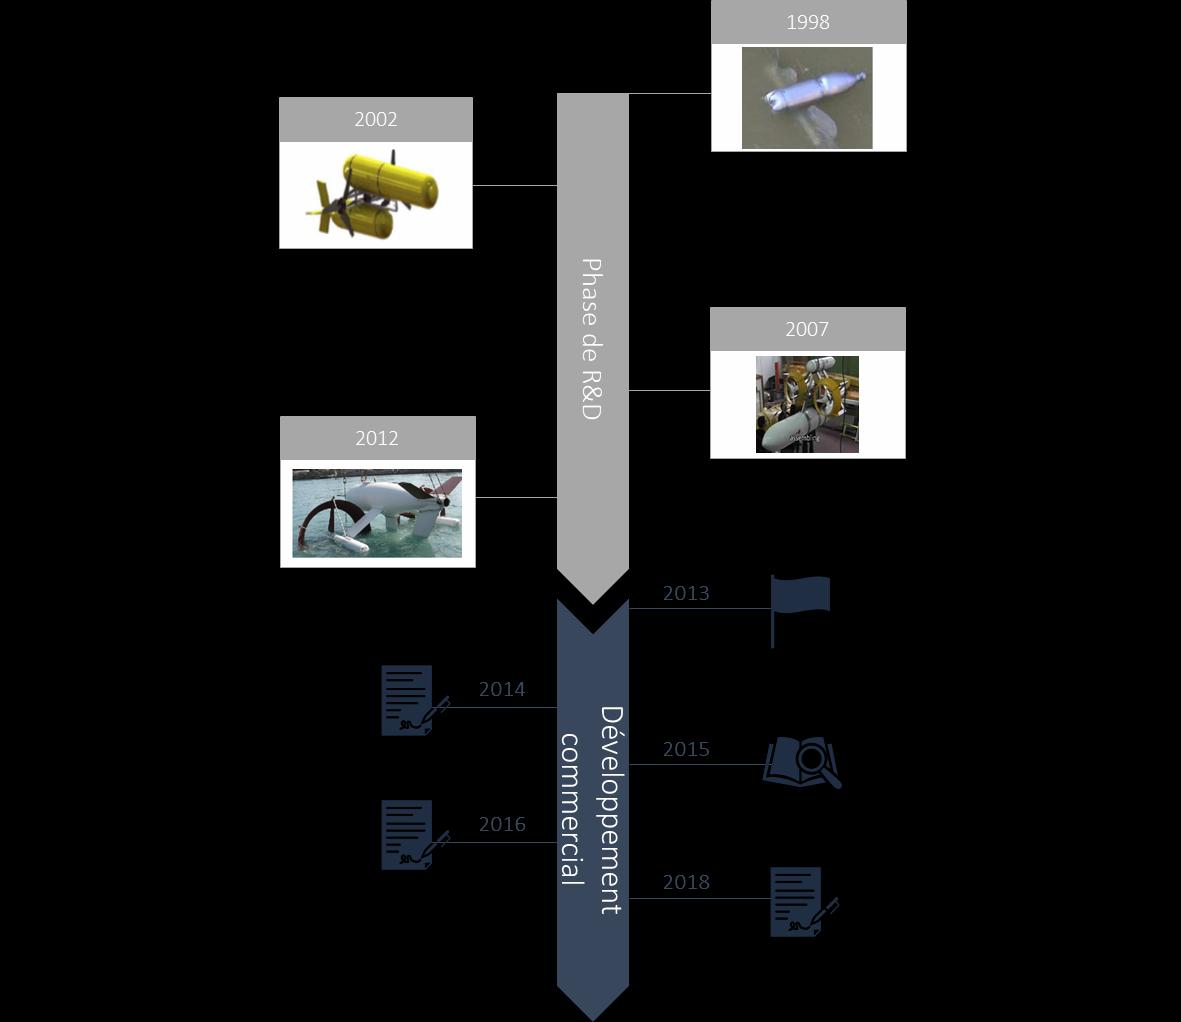 Blue Shark Power System Historique